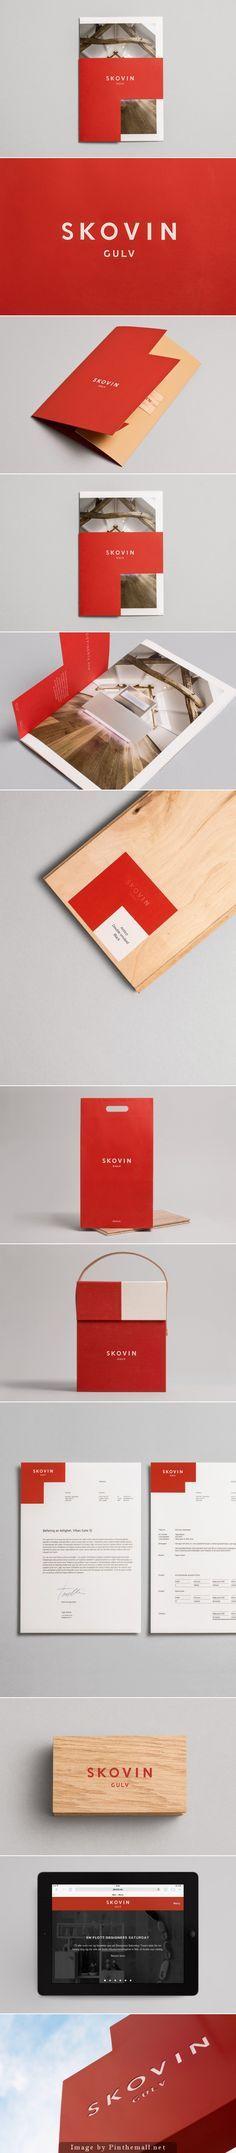 Skovin brand identity and collaterals designed by Heydays